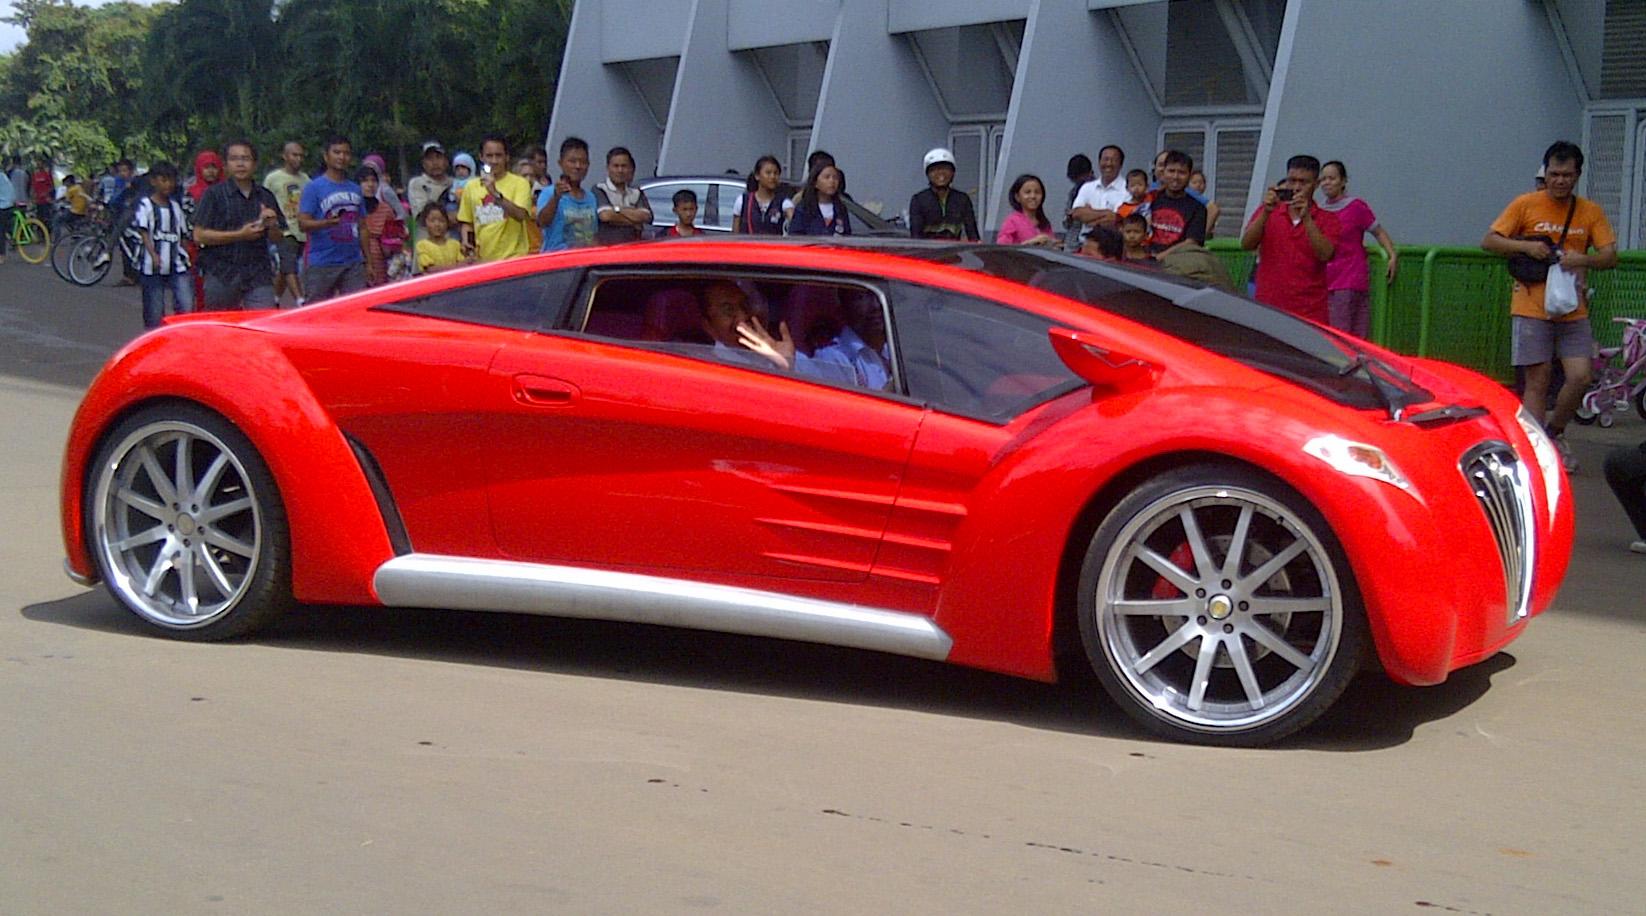 Tucuxi Tuku Iki Mobil Listrik Indonesia Harga 1 5 M